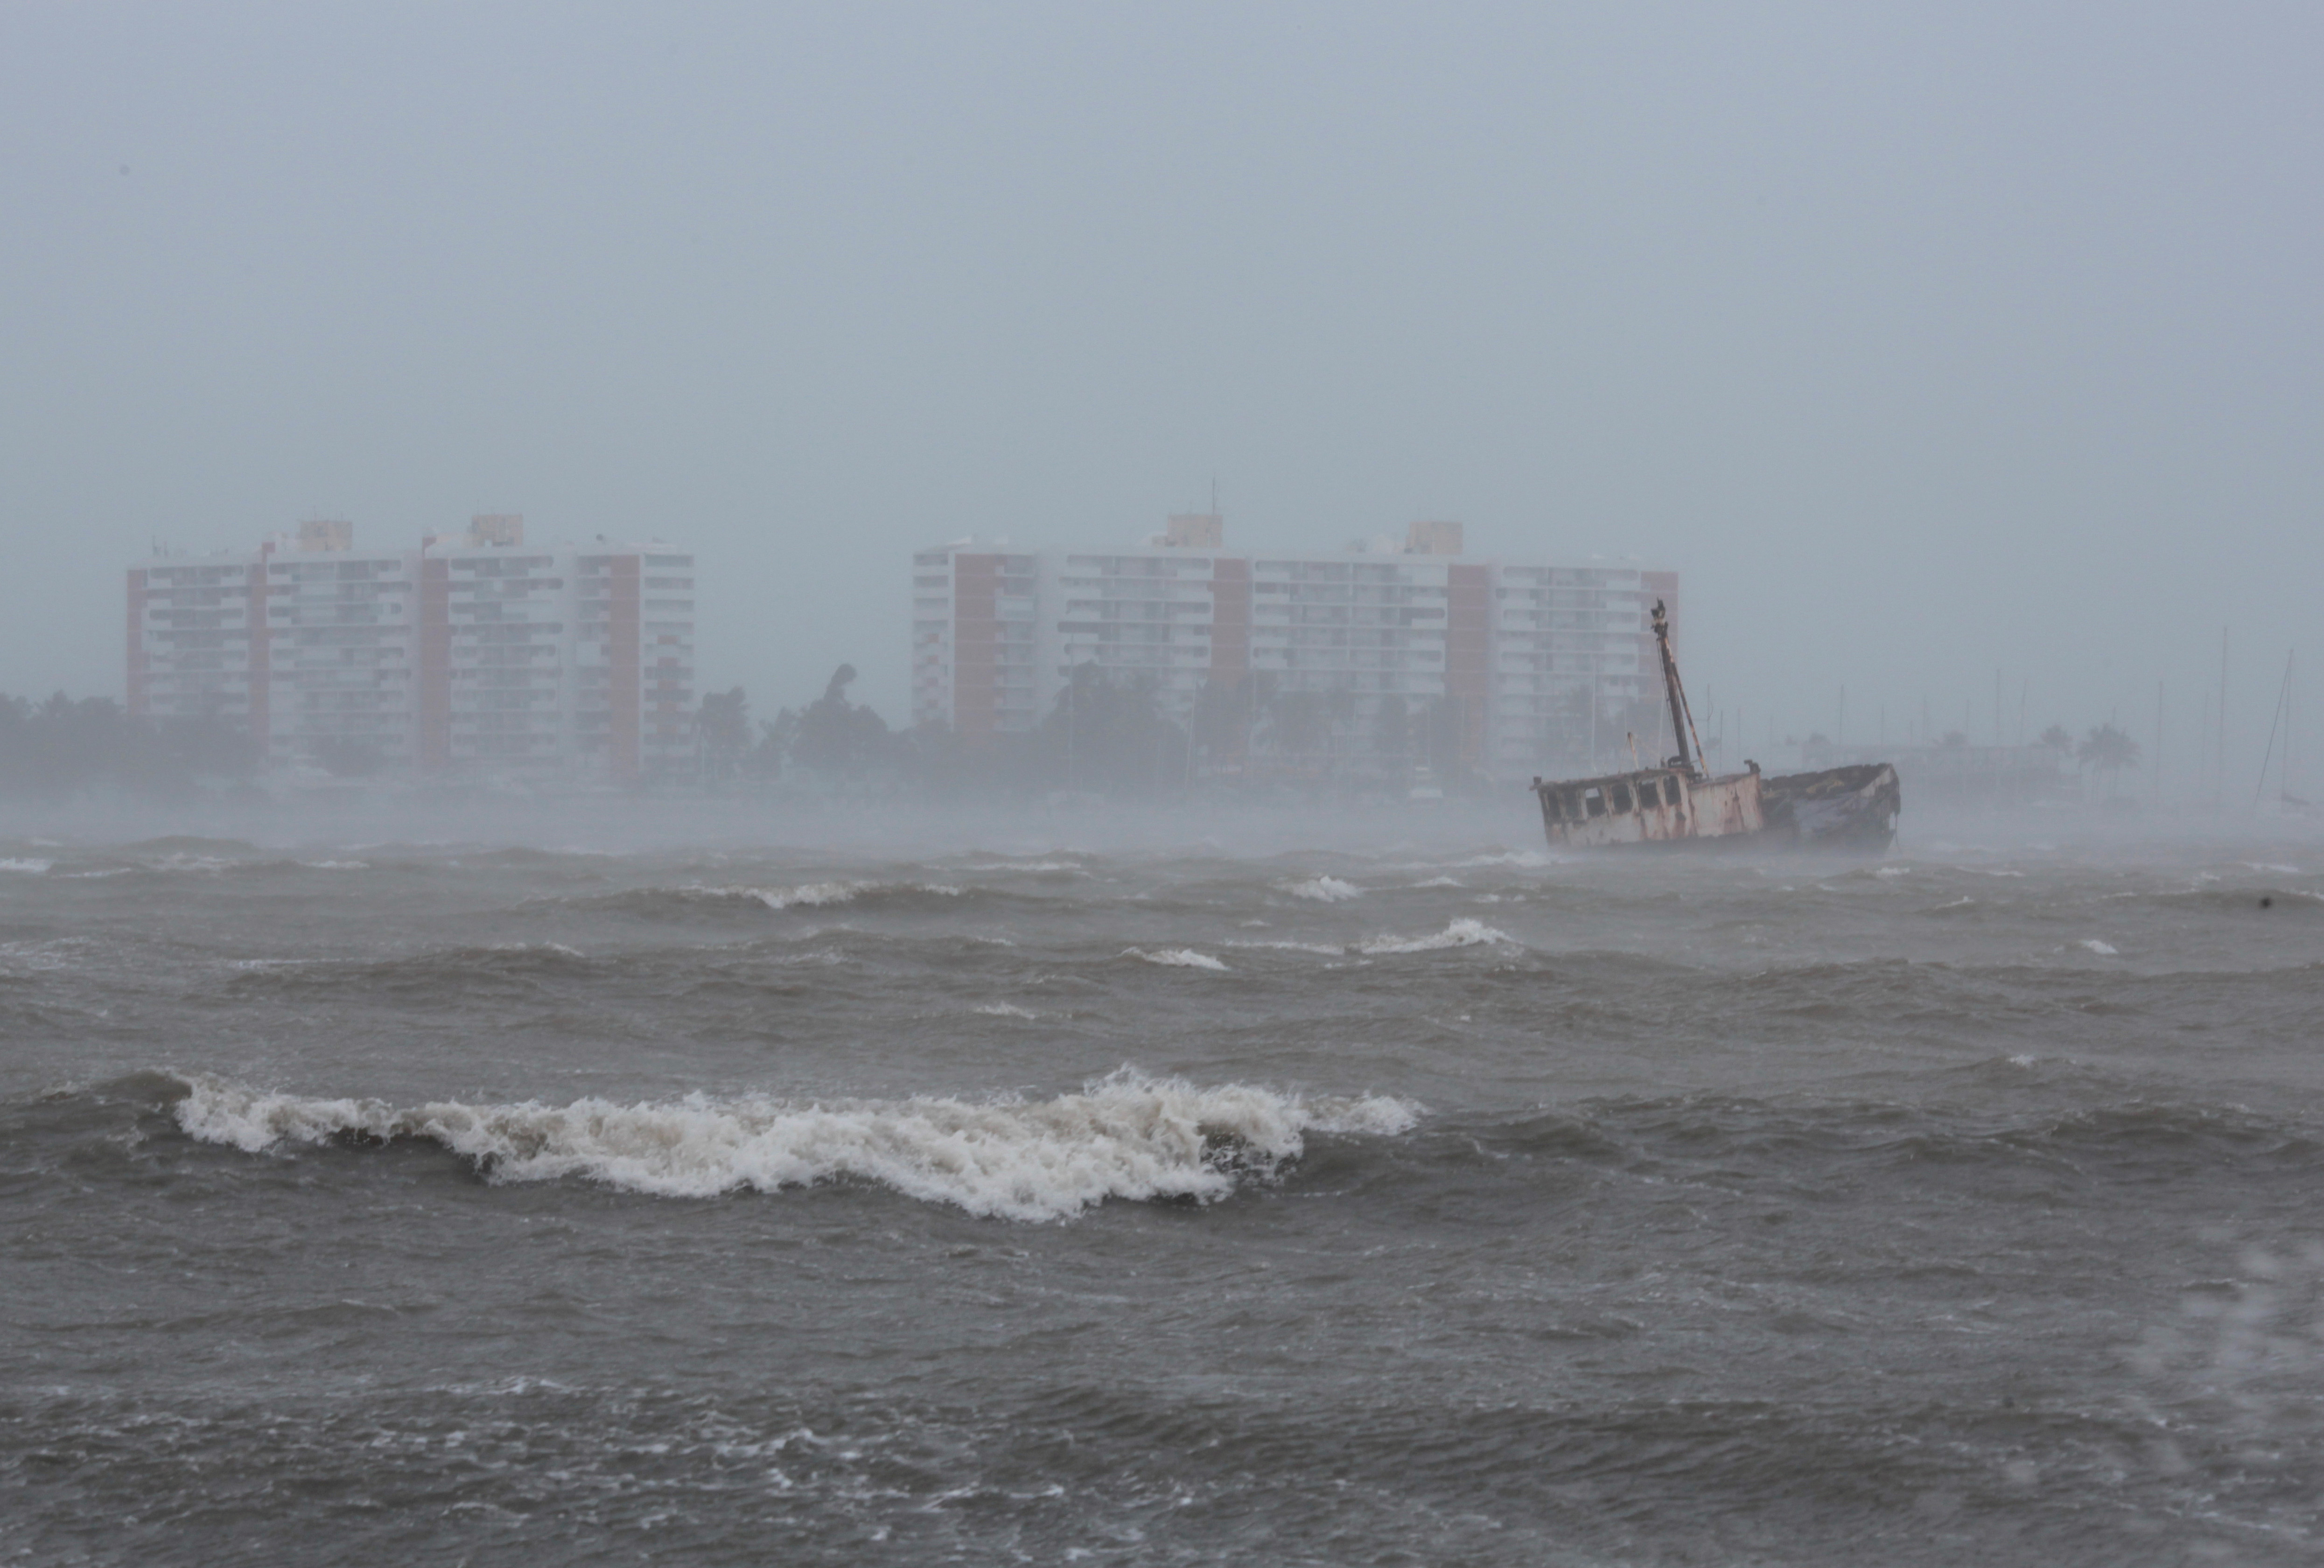 Waves battle a stranded ship in Fajardo, Puerto Rico. (REUTERS/Alvin Baez)